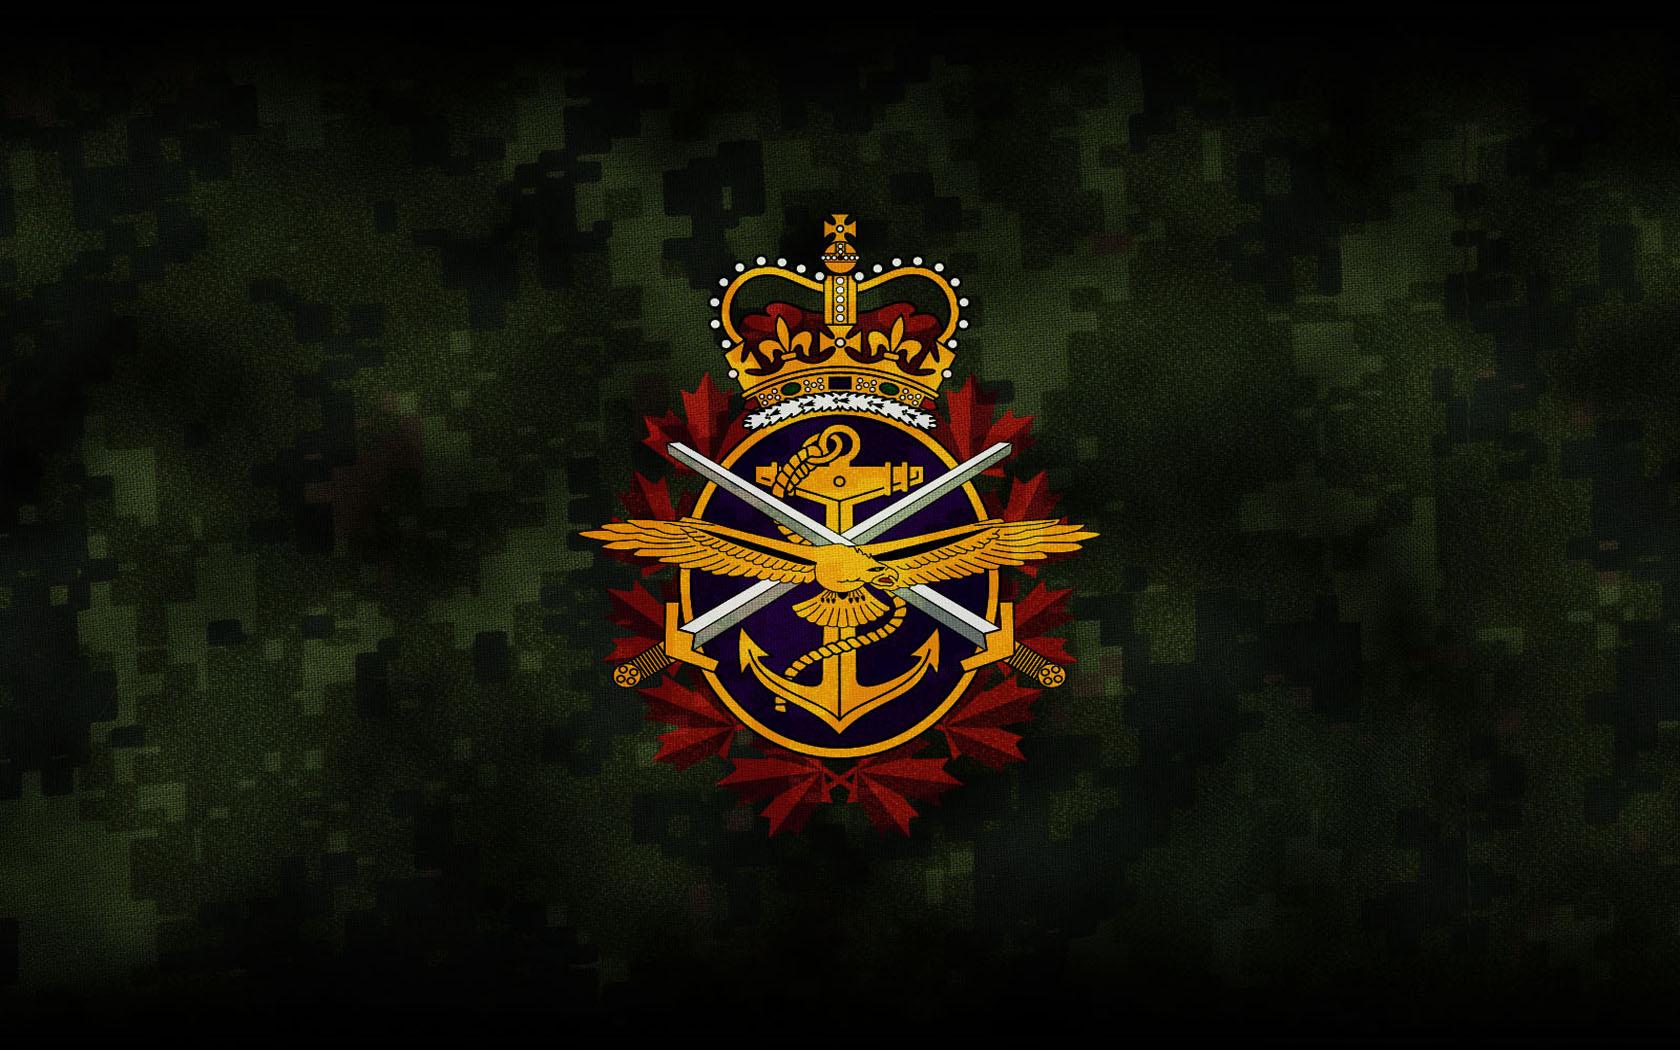 Canadian army wallpapers wallpapersafari - Military wallpaper army ...